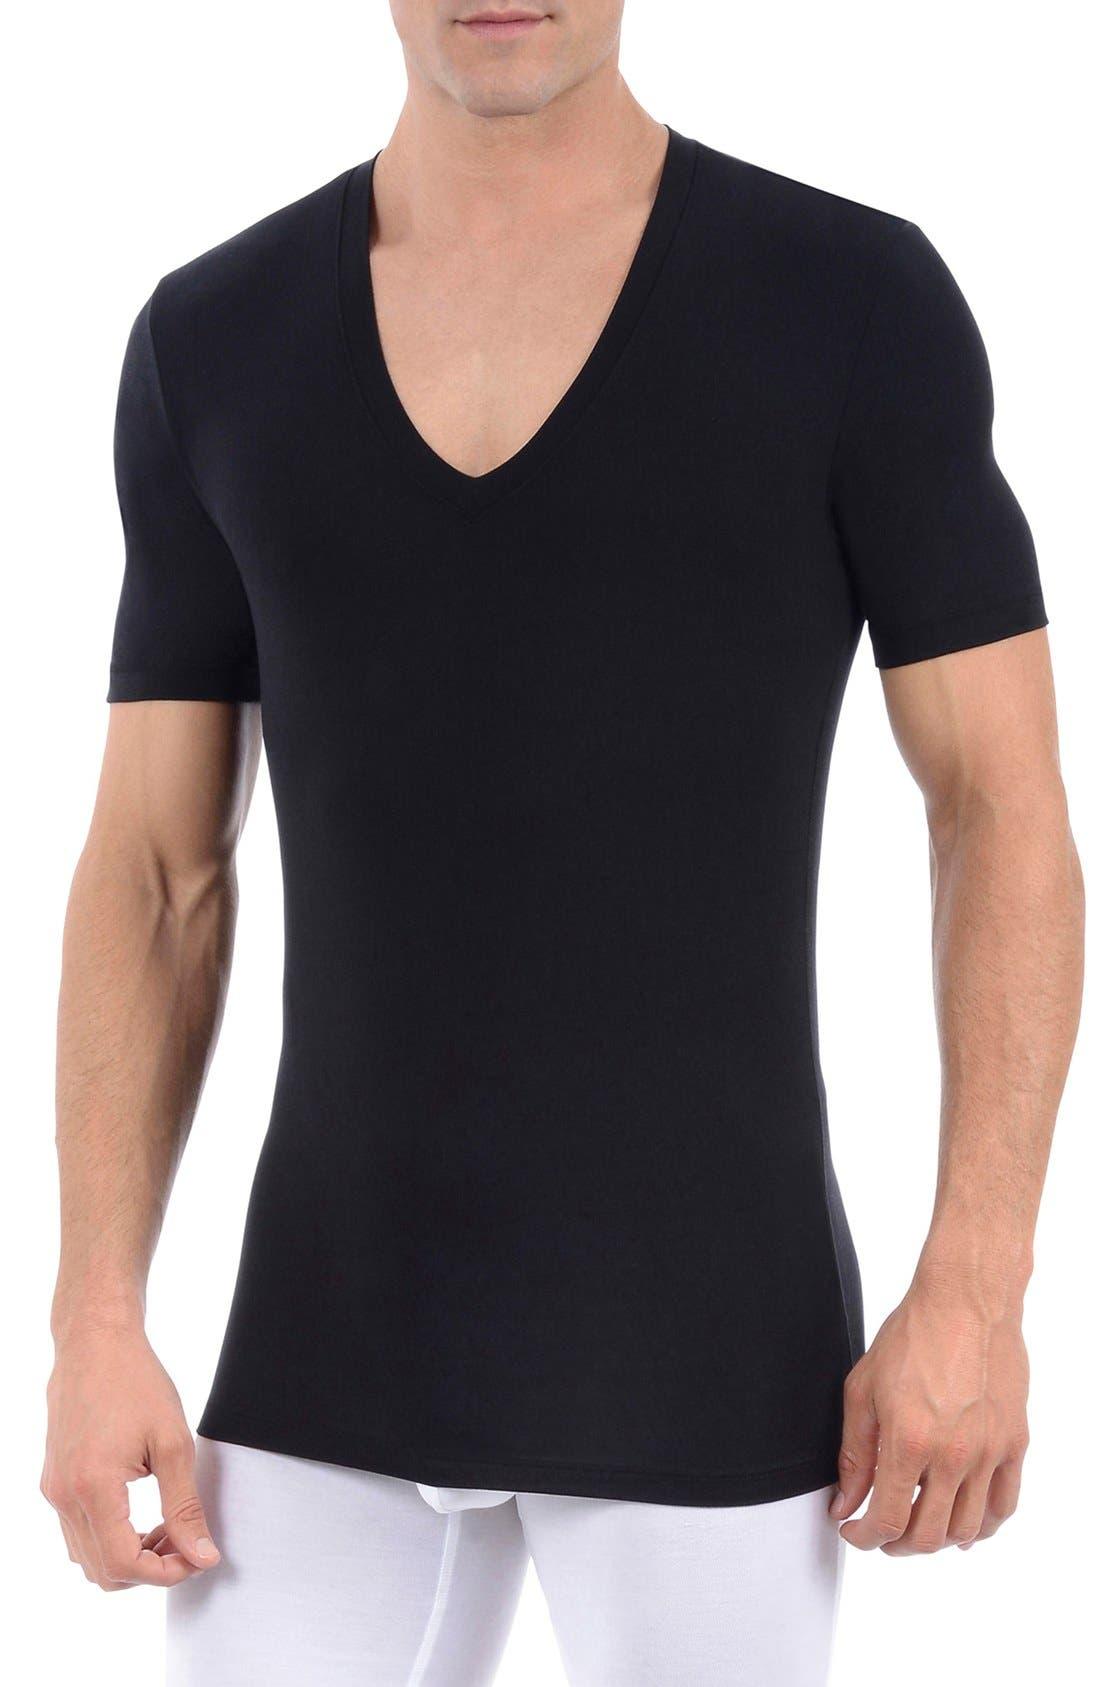 Main Image - Tommy John 'Second Skin' Deep V-Neck Undershirt